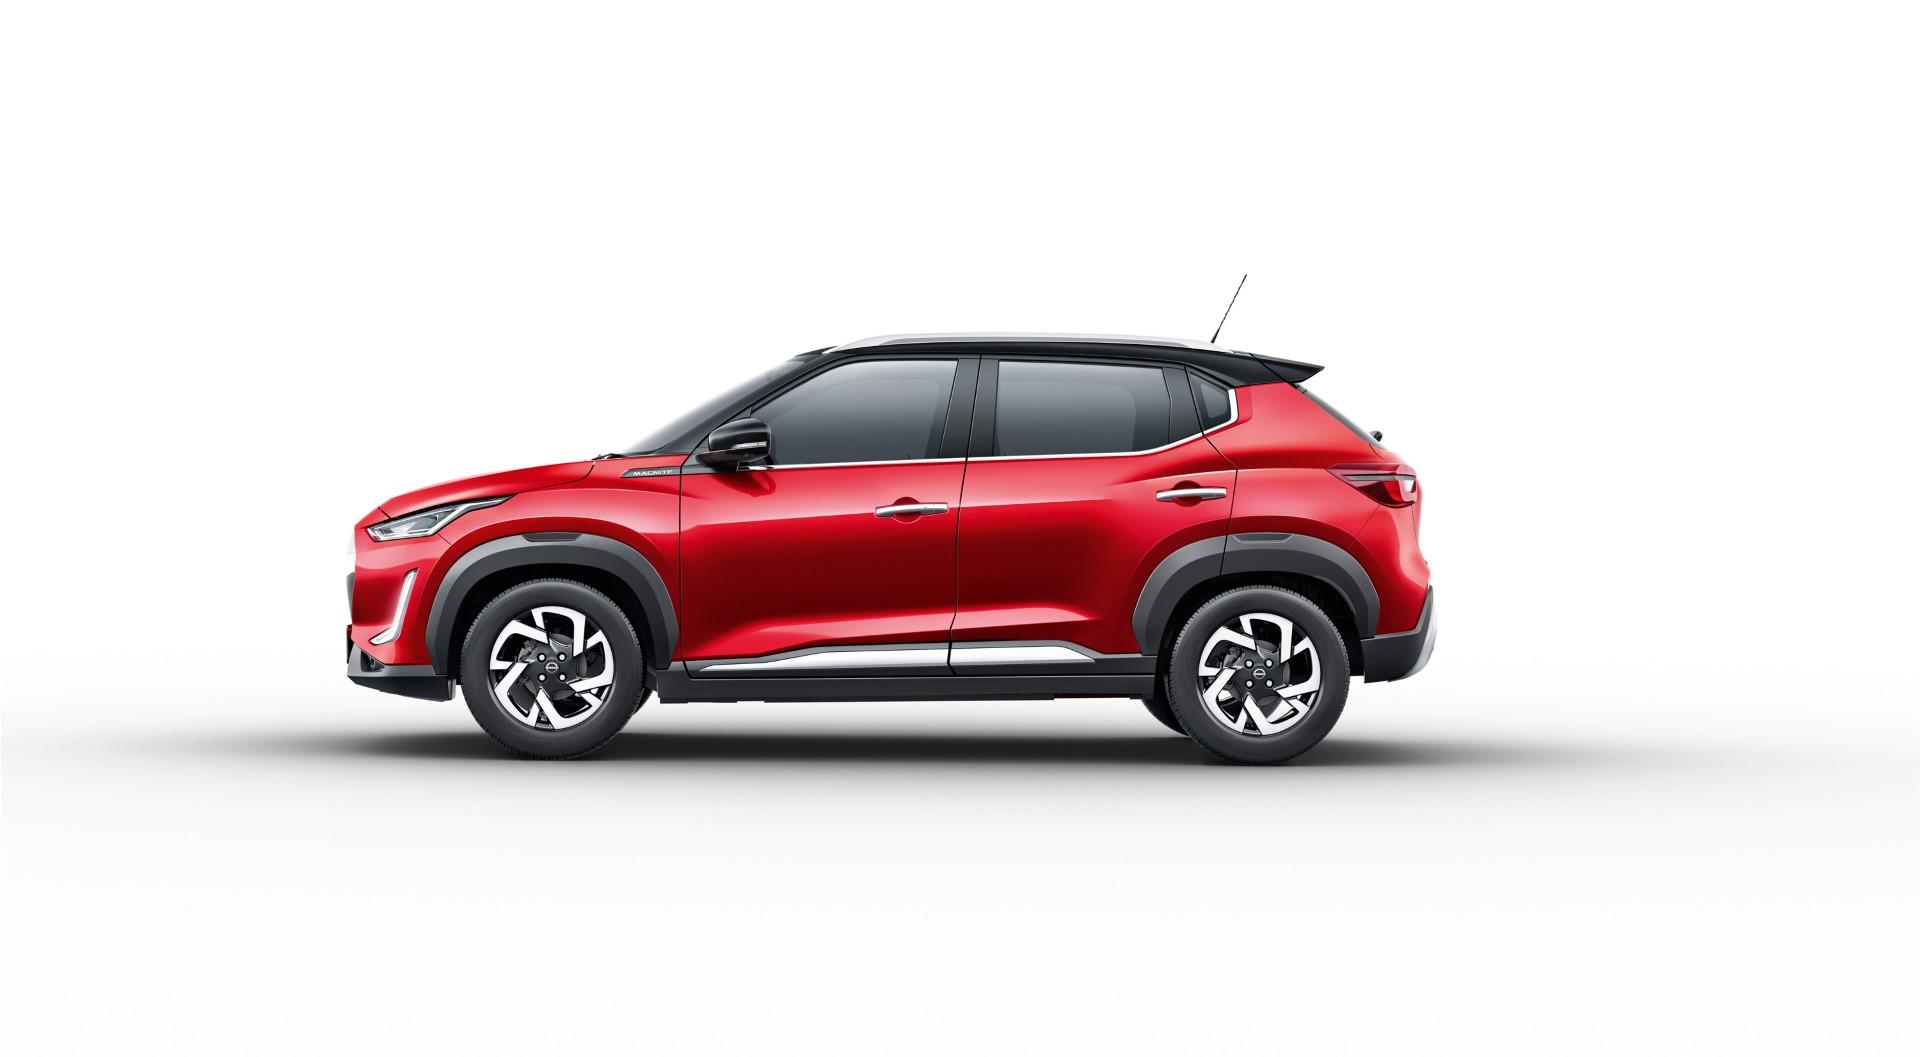 2021 Nissan Magnite side profile